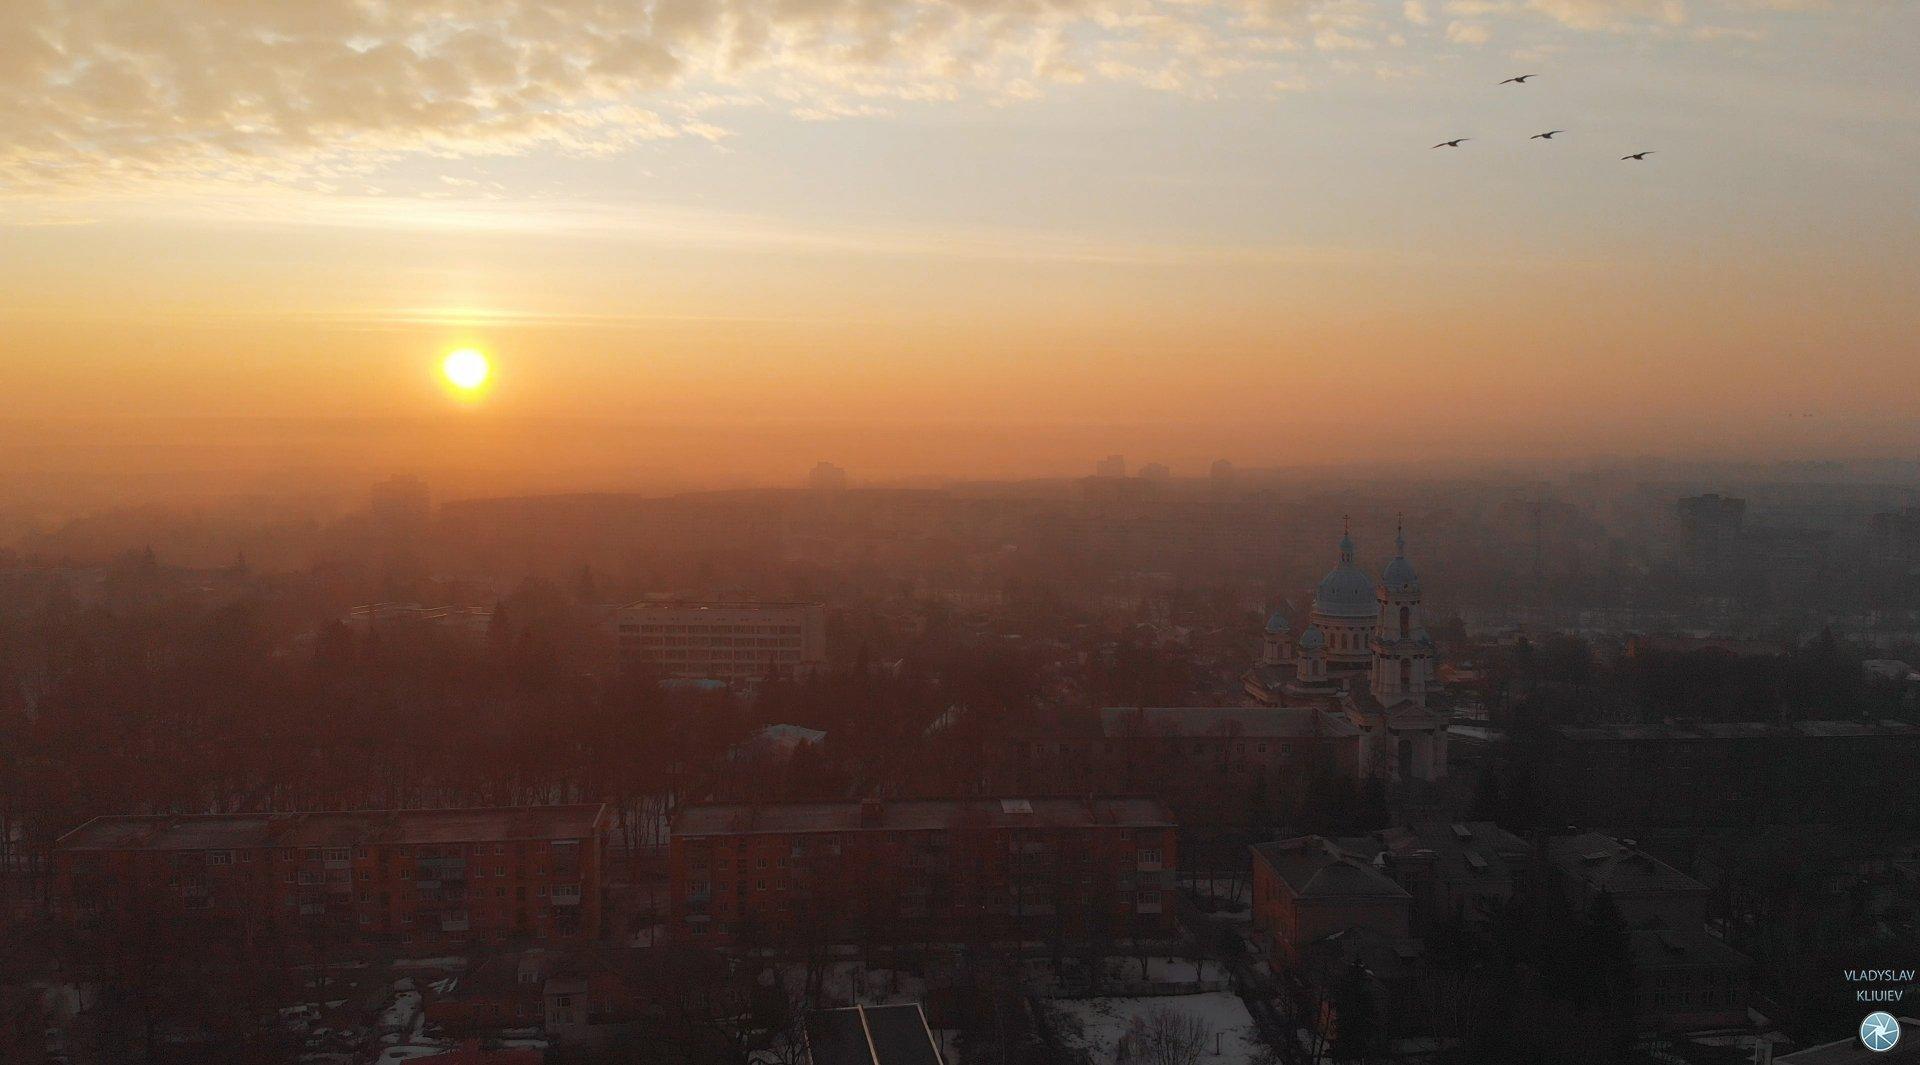 аэросъемка, пейзаж, панорама, Владислав